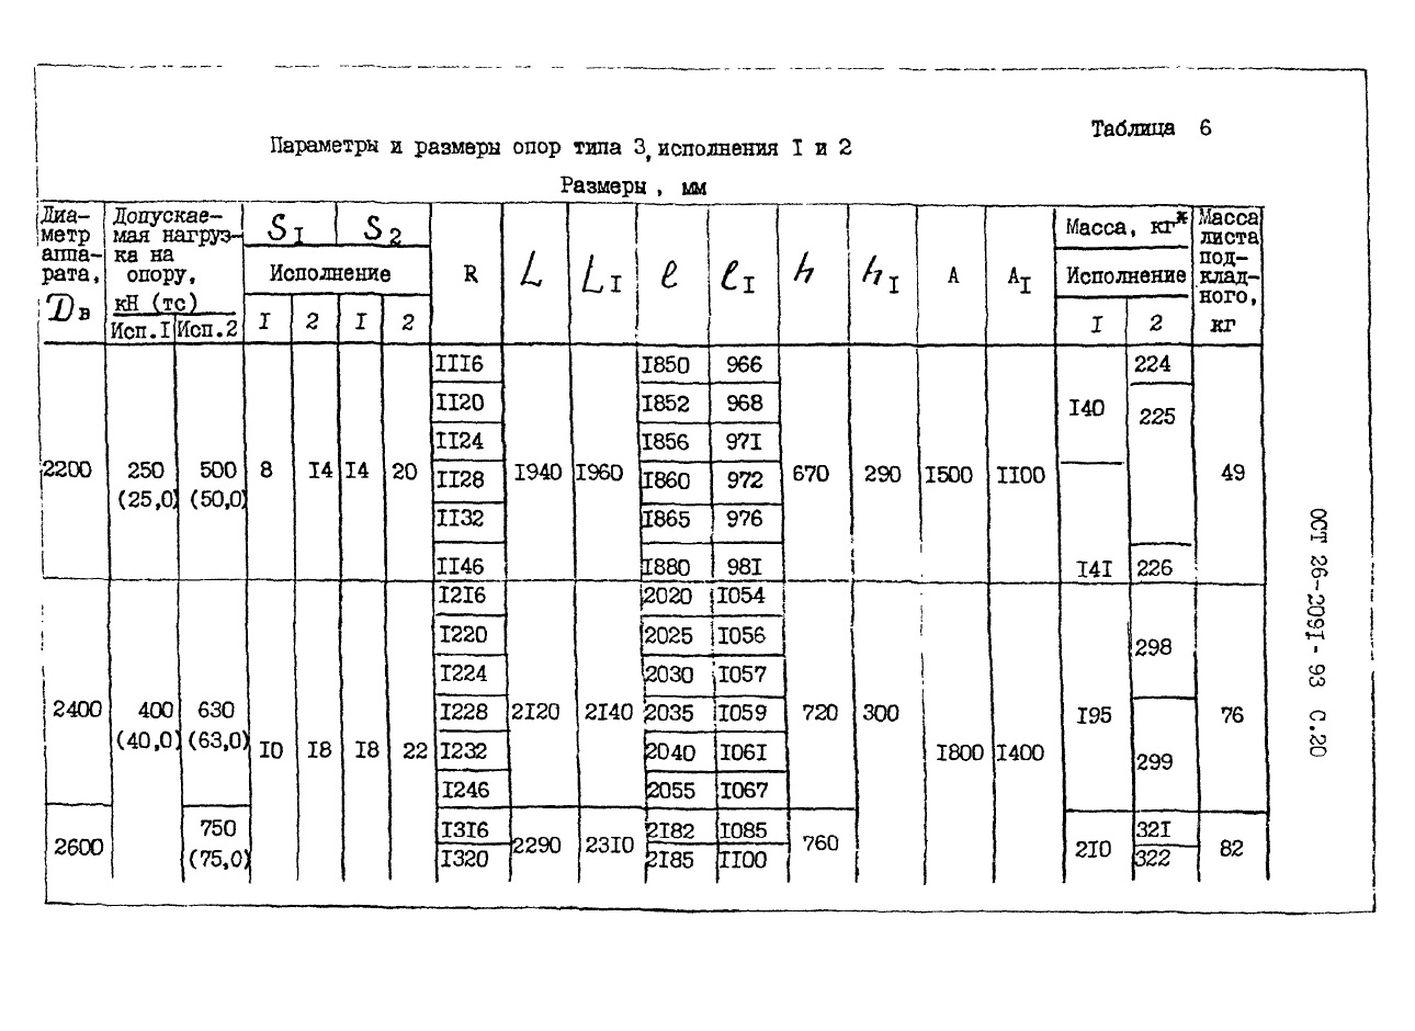 Опоры тип 3 ОСТ 26-2091-93 стр.3